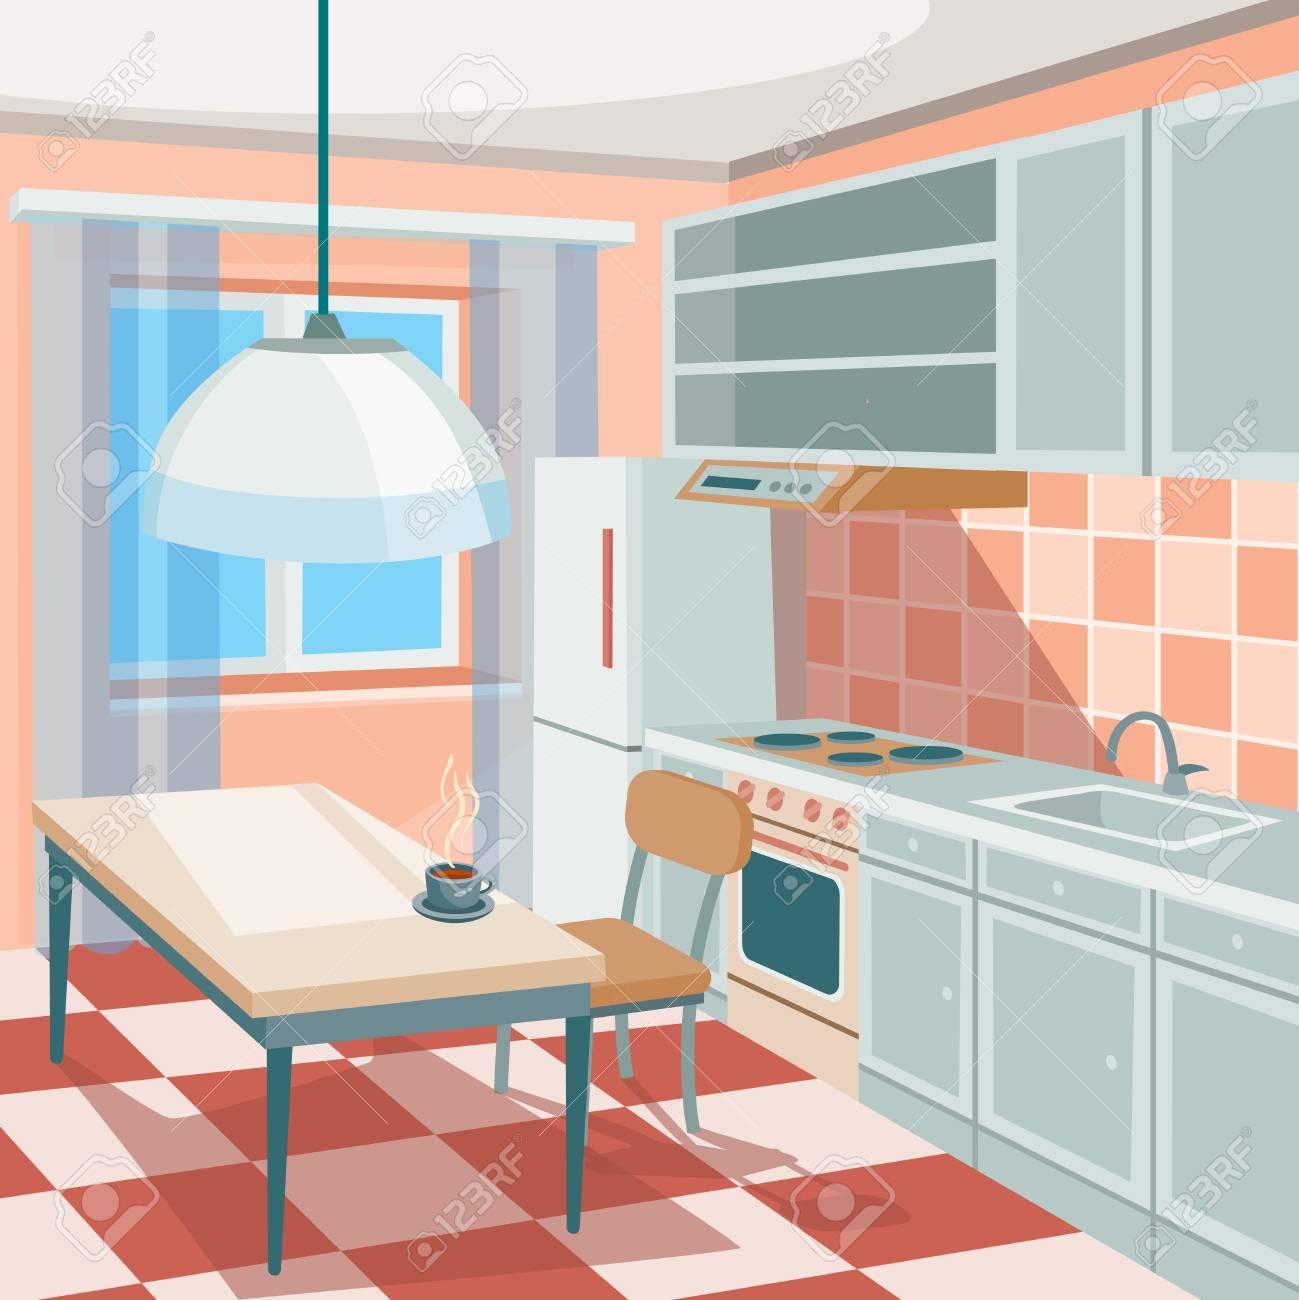 Cartoon Illustration Of A Kitchen Interior With Kitchen Cabinets